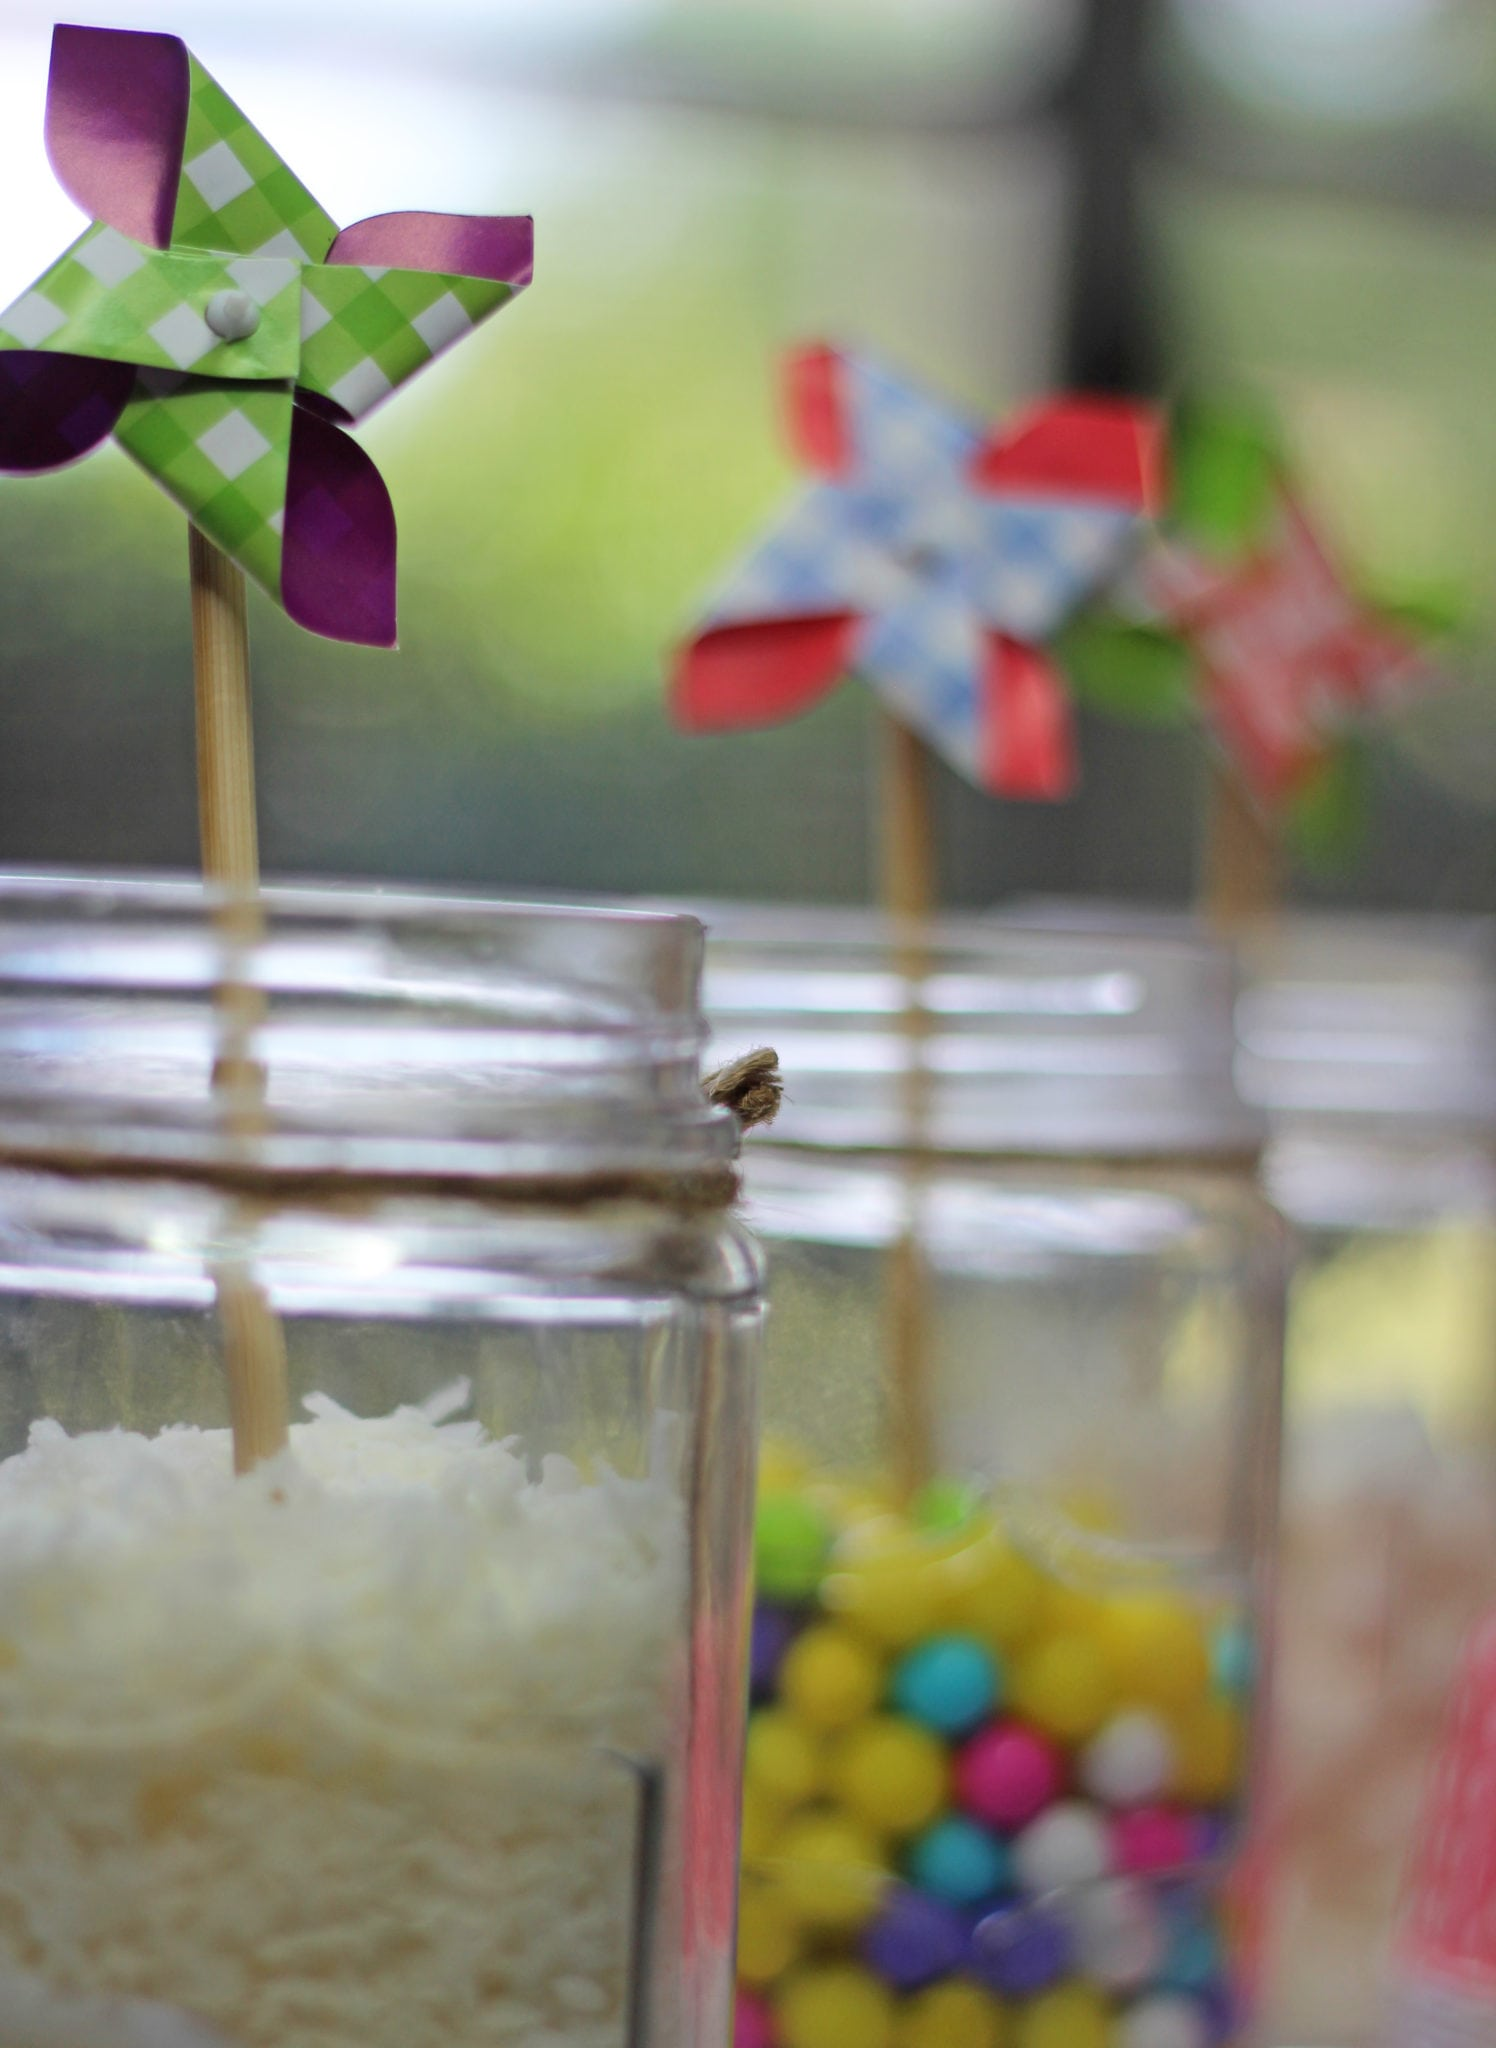 DIY Ice cream bar with Haagen Daaz from style and beauty blogger Mash Elle | DIY Ice cream bar with candy from style and beauty blogger Mash Elle | summer desserts | ice cream party | summer treats